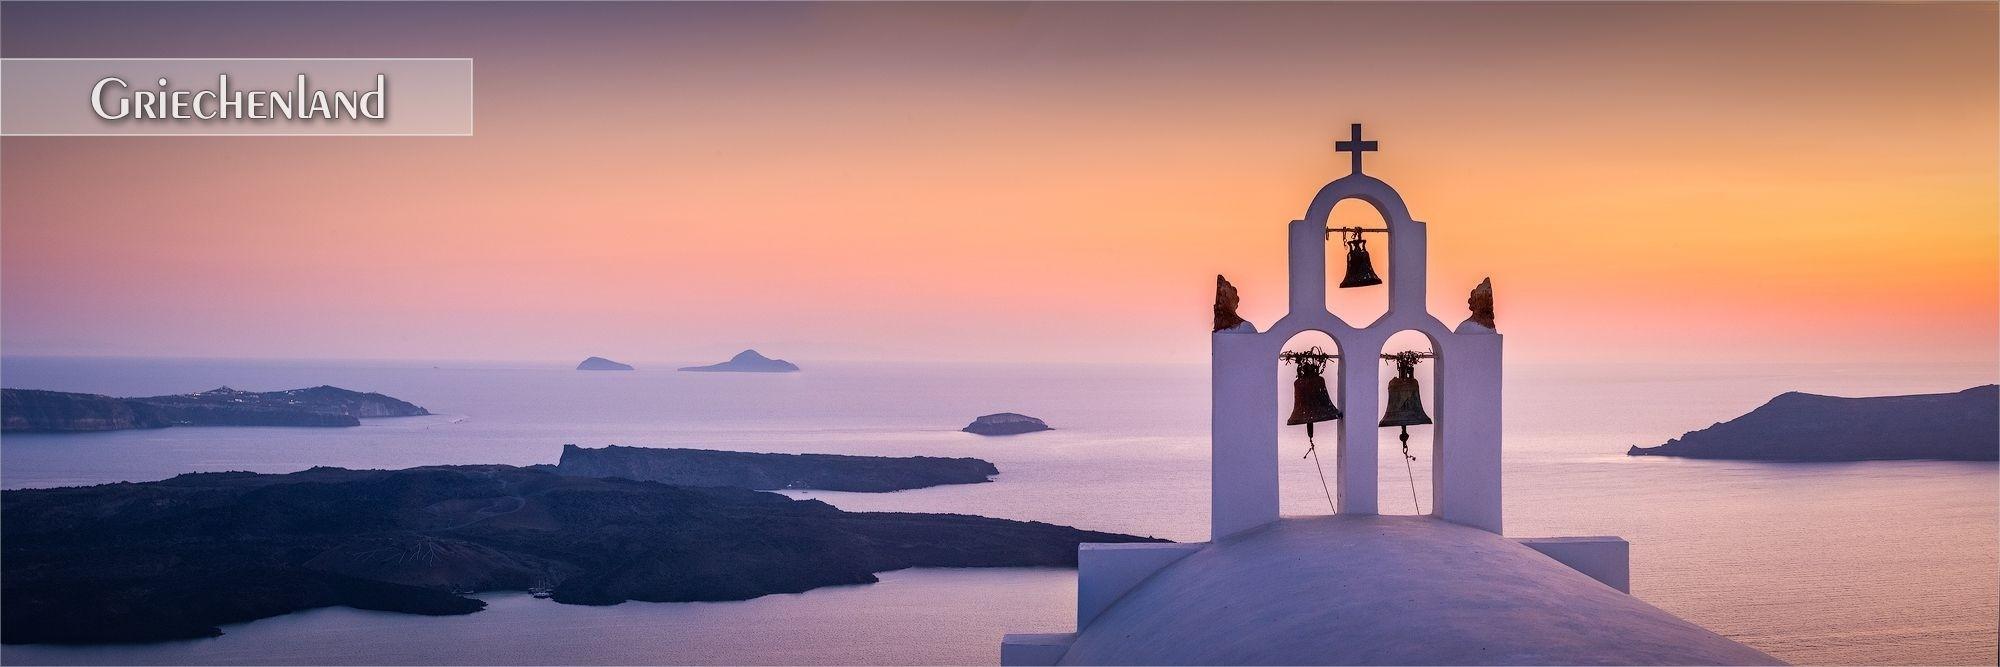 Bilder aus Griechenland als Wandbild oder Küchenrückwand